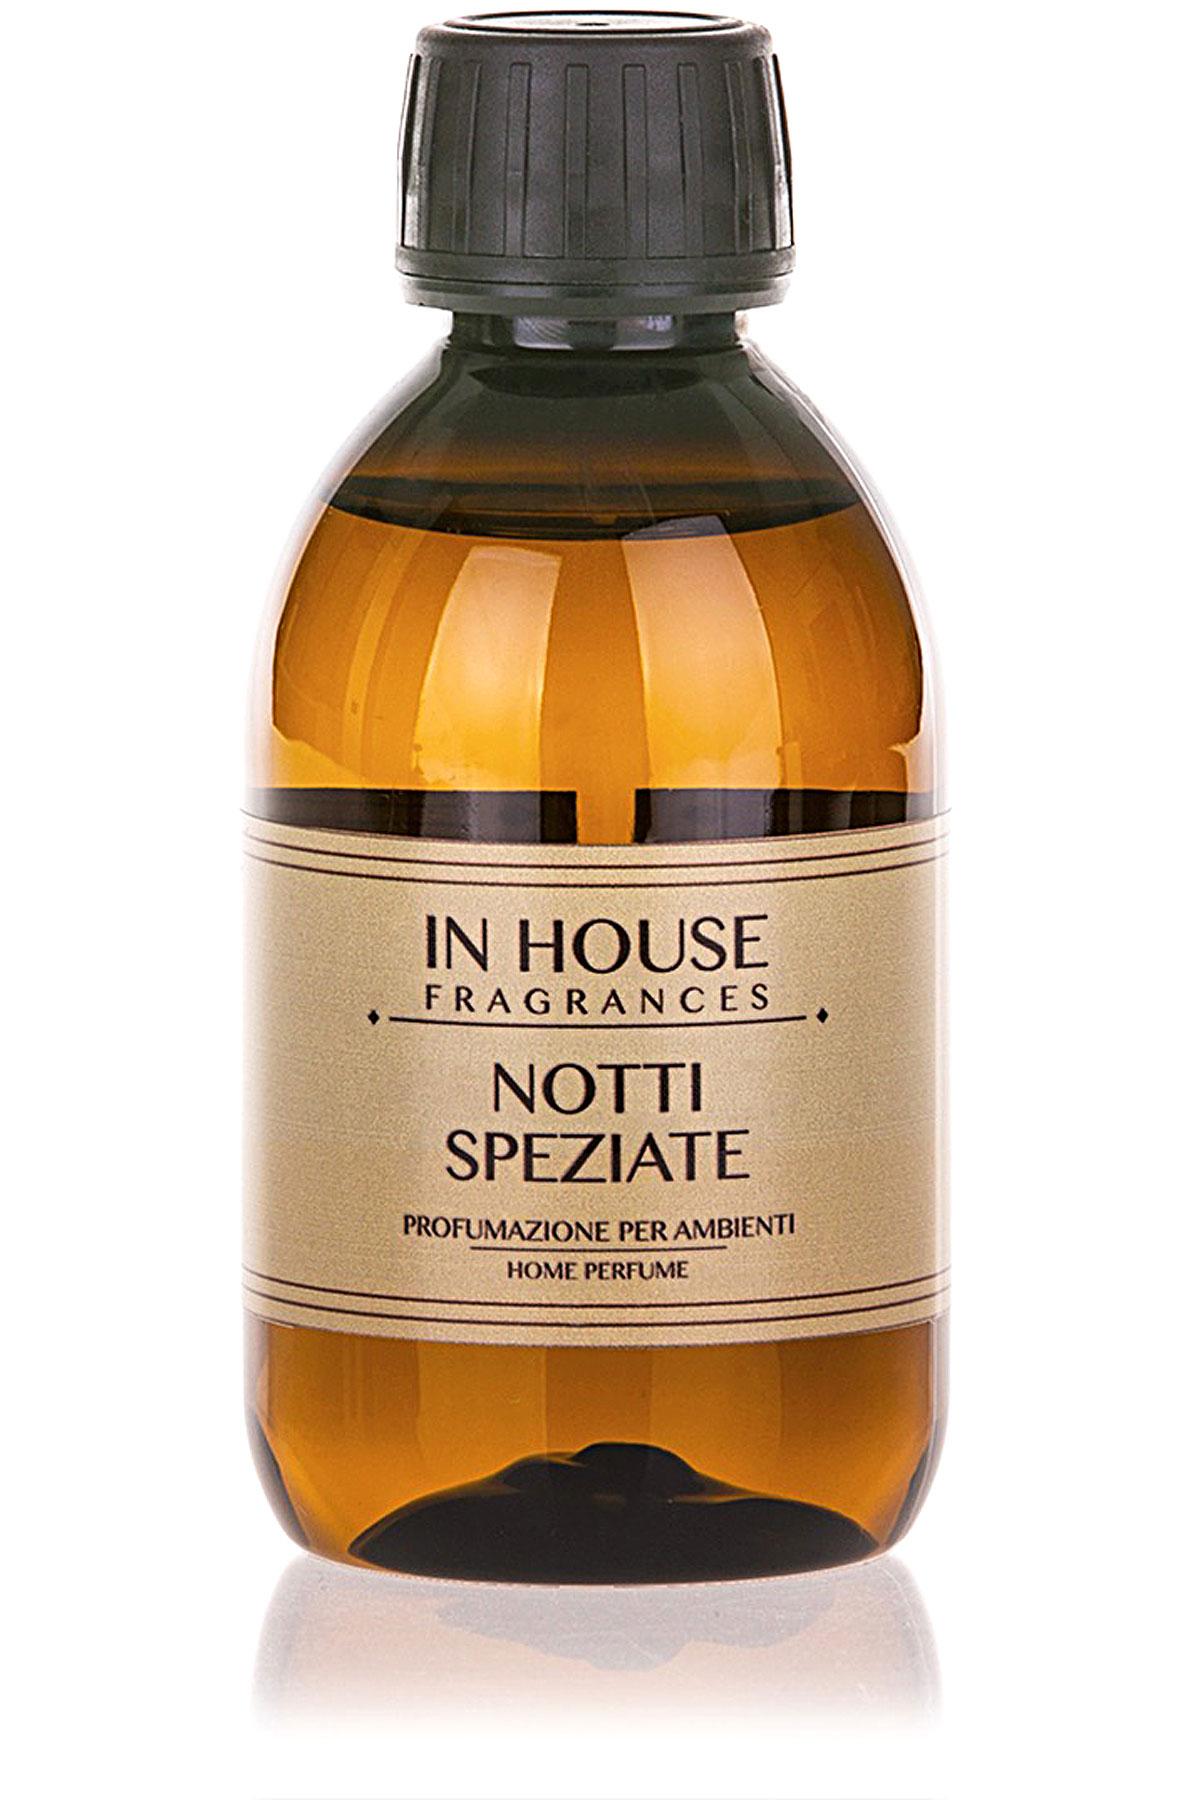 In House Fragrances Home Scents for Men, Notti Speziate - Refill - 200 Ml, 2019, 200 ml